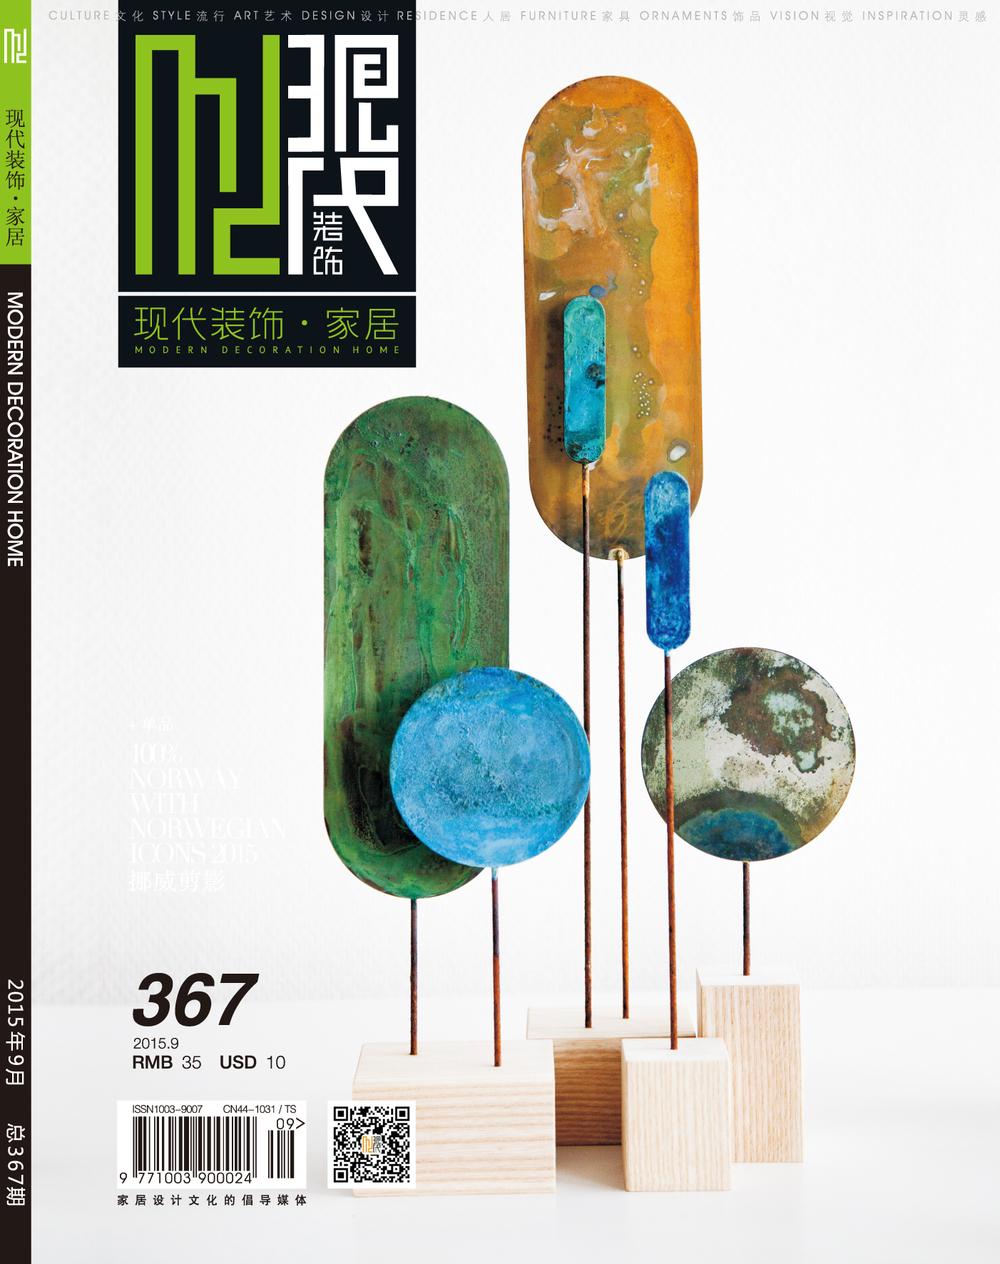 Modern Decoration Sept 2015 front cover.jpg